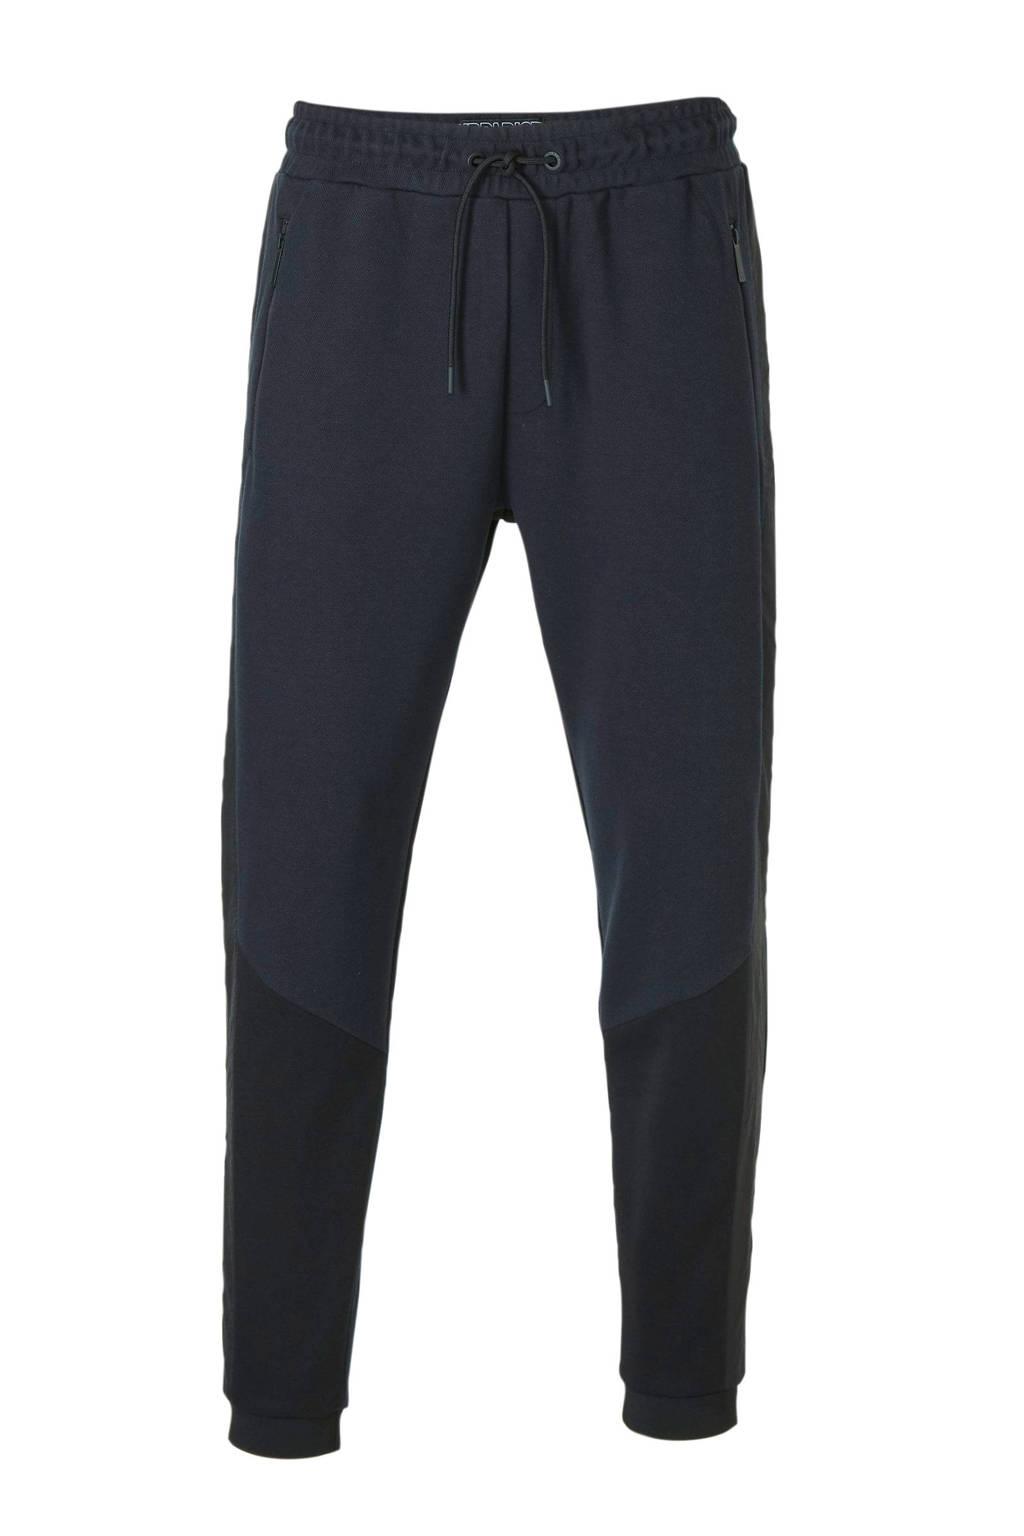 C&A Angelo Litrico regular fit joggingbroek donkerblauw/zwart/oranje, Donkerblauw/zwart/oranje